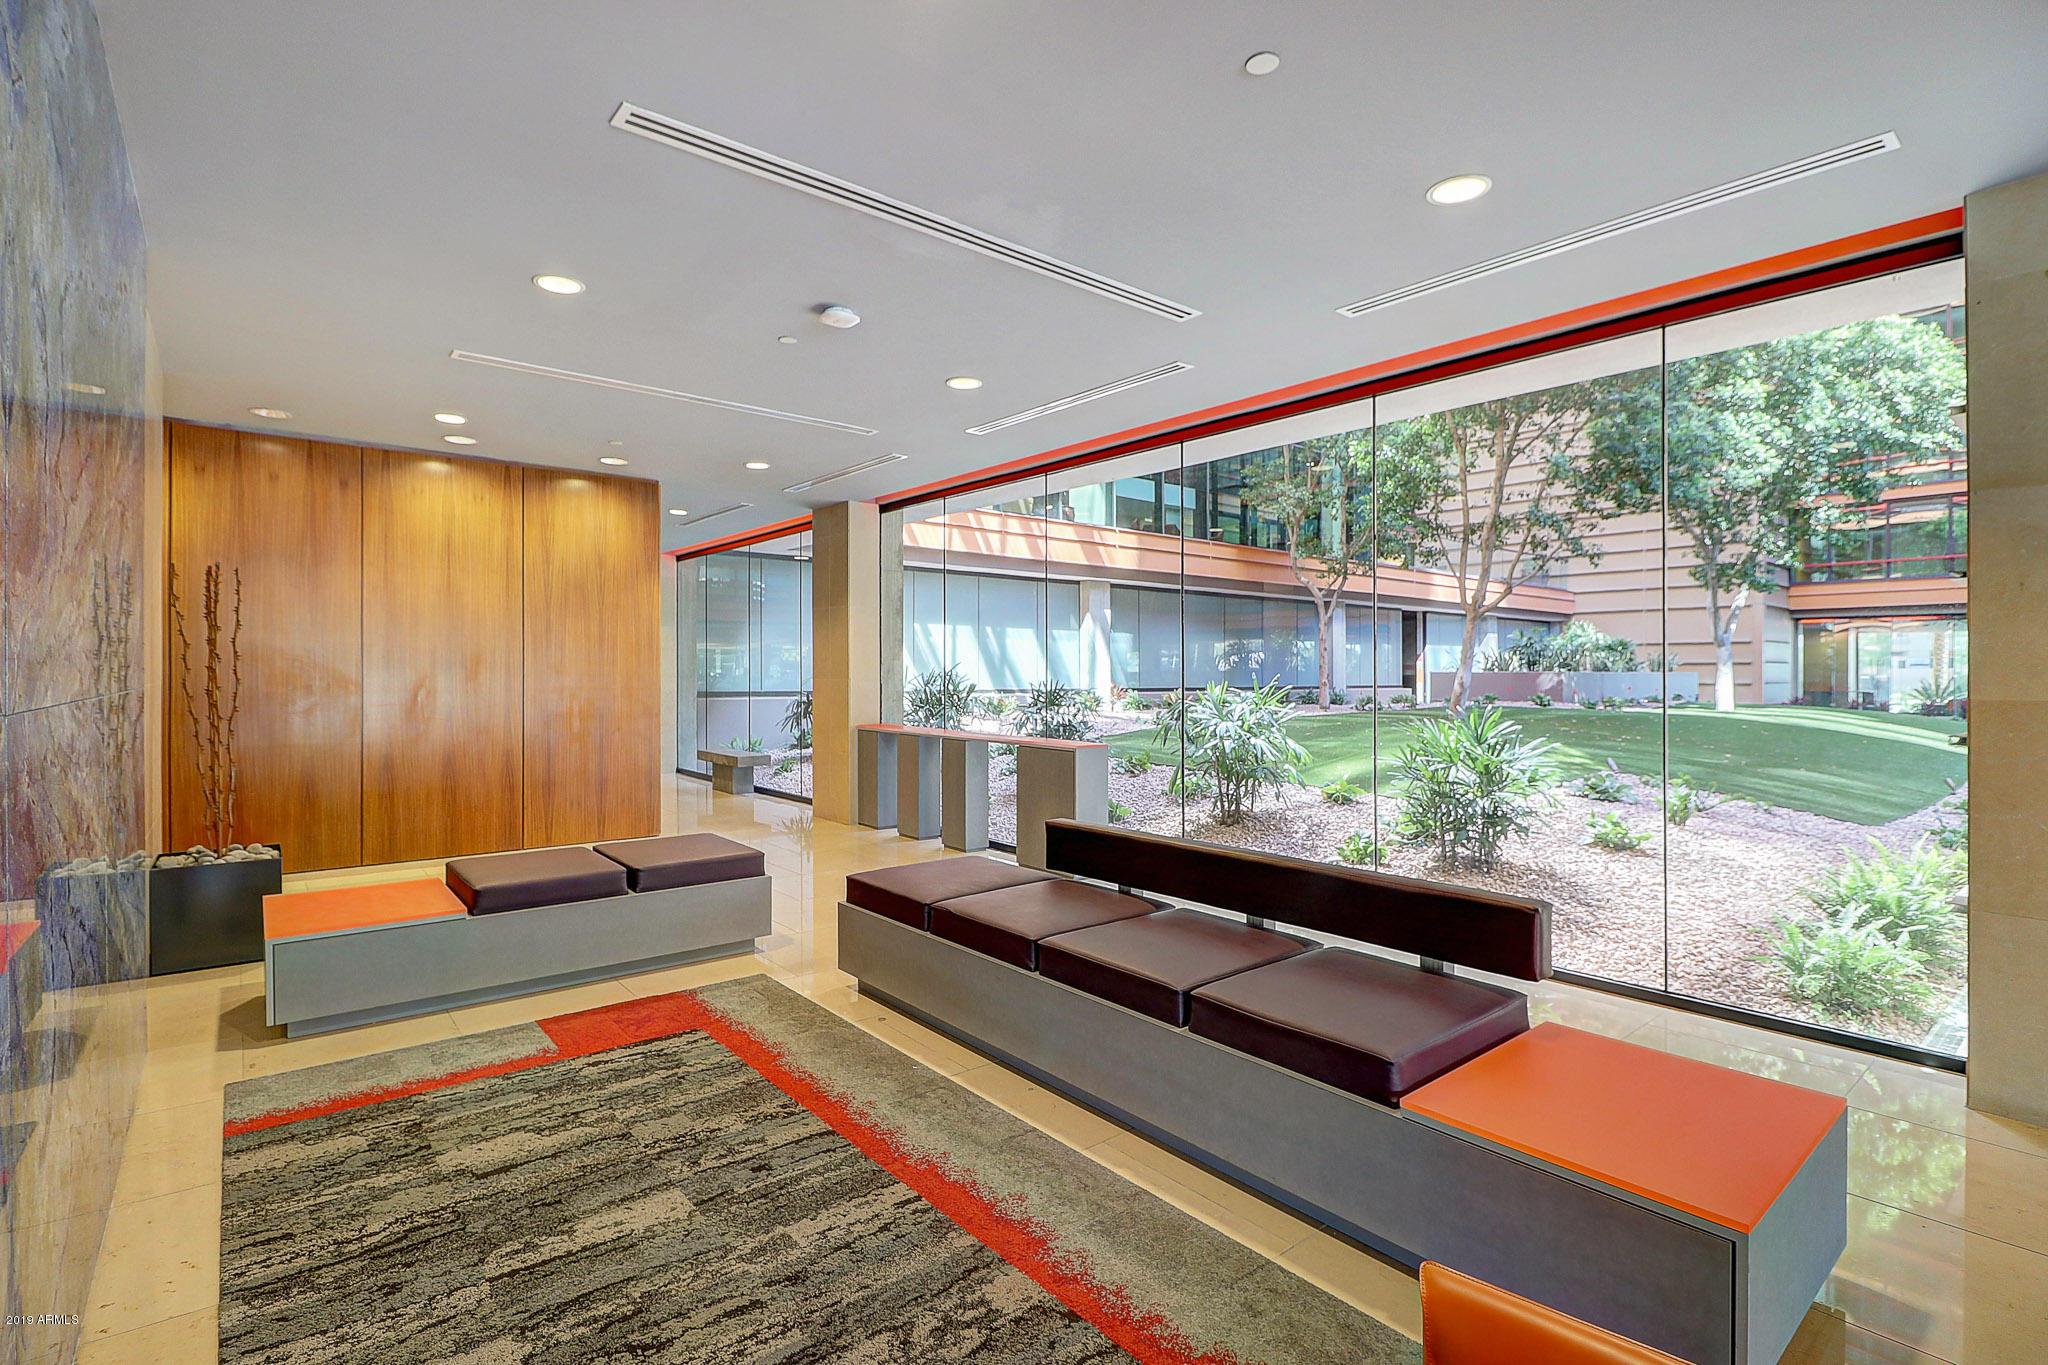 MLS 5900536 4808 N 24TH Street Unit 528 Building West, Phoenix, AZ 85016 Phoenix AZ REO Bank Owned Foreclosure